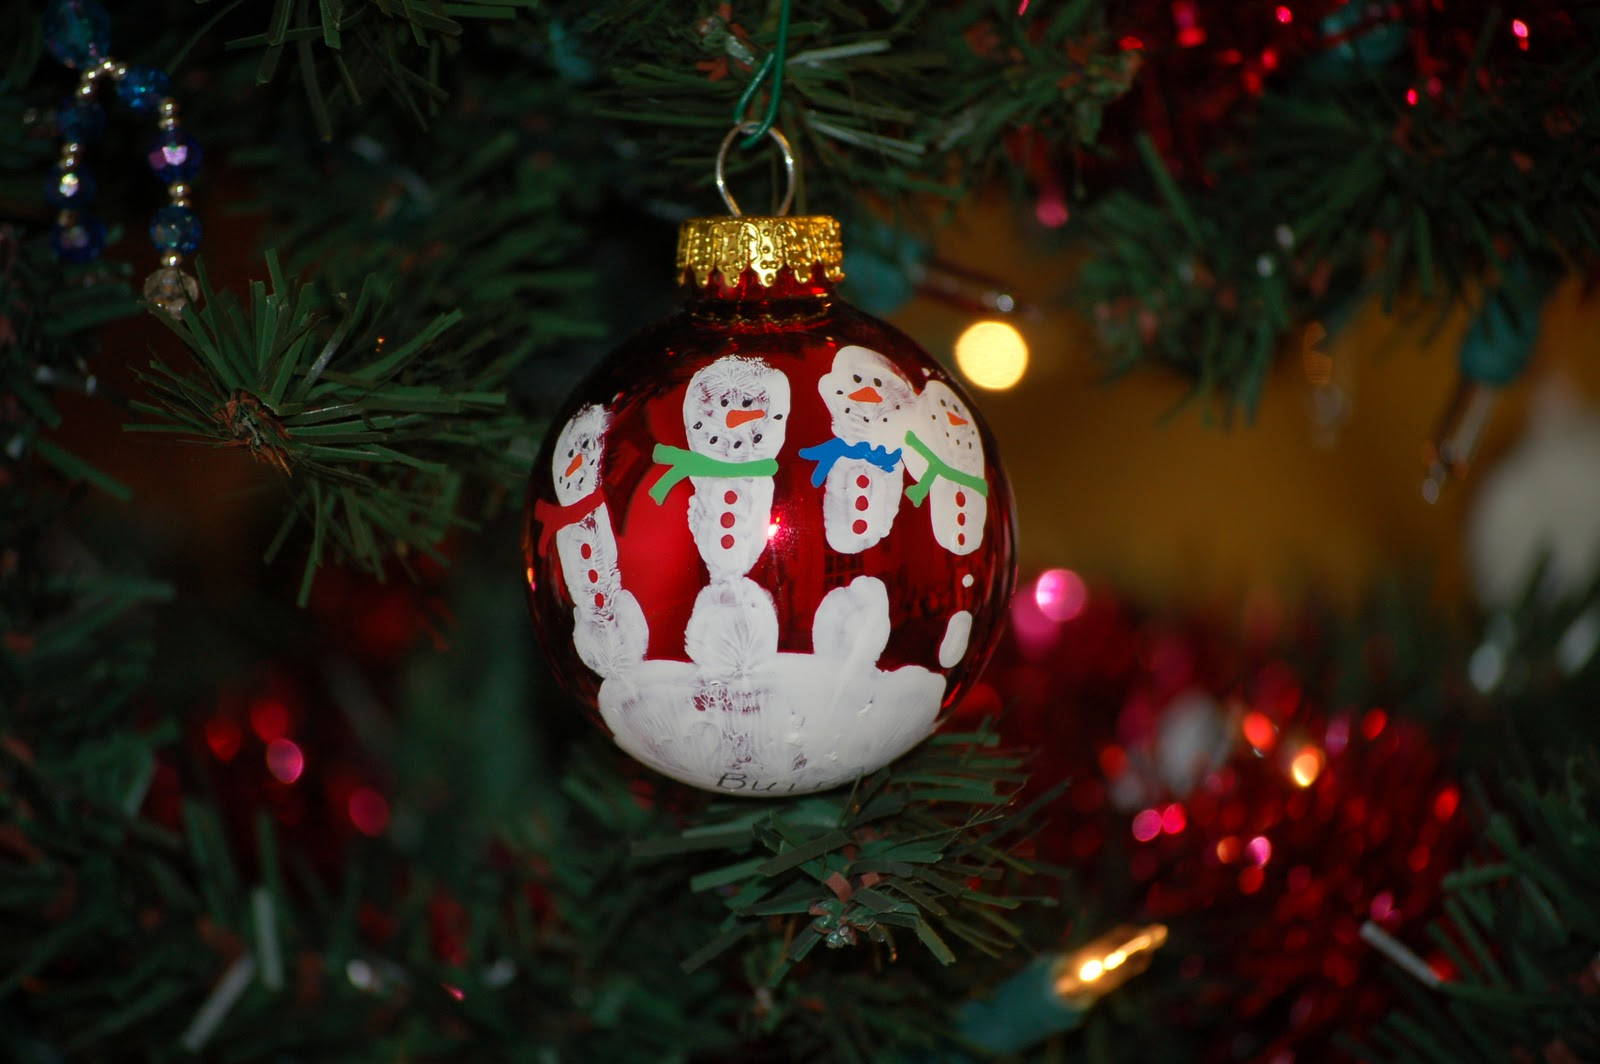 Handprints And Fingerprints For Gift Giving